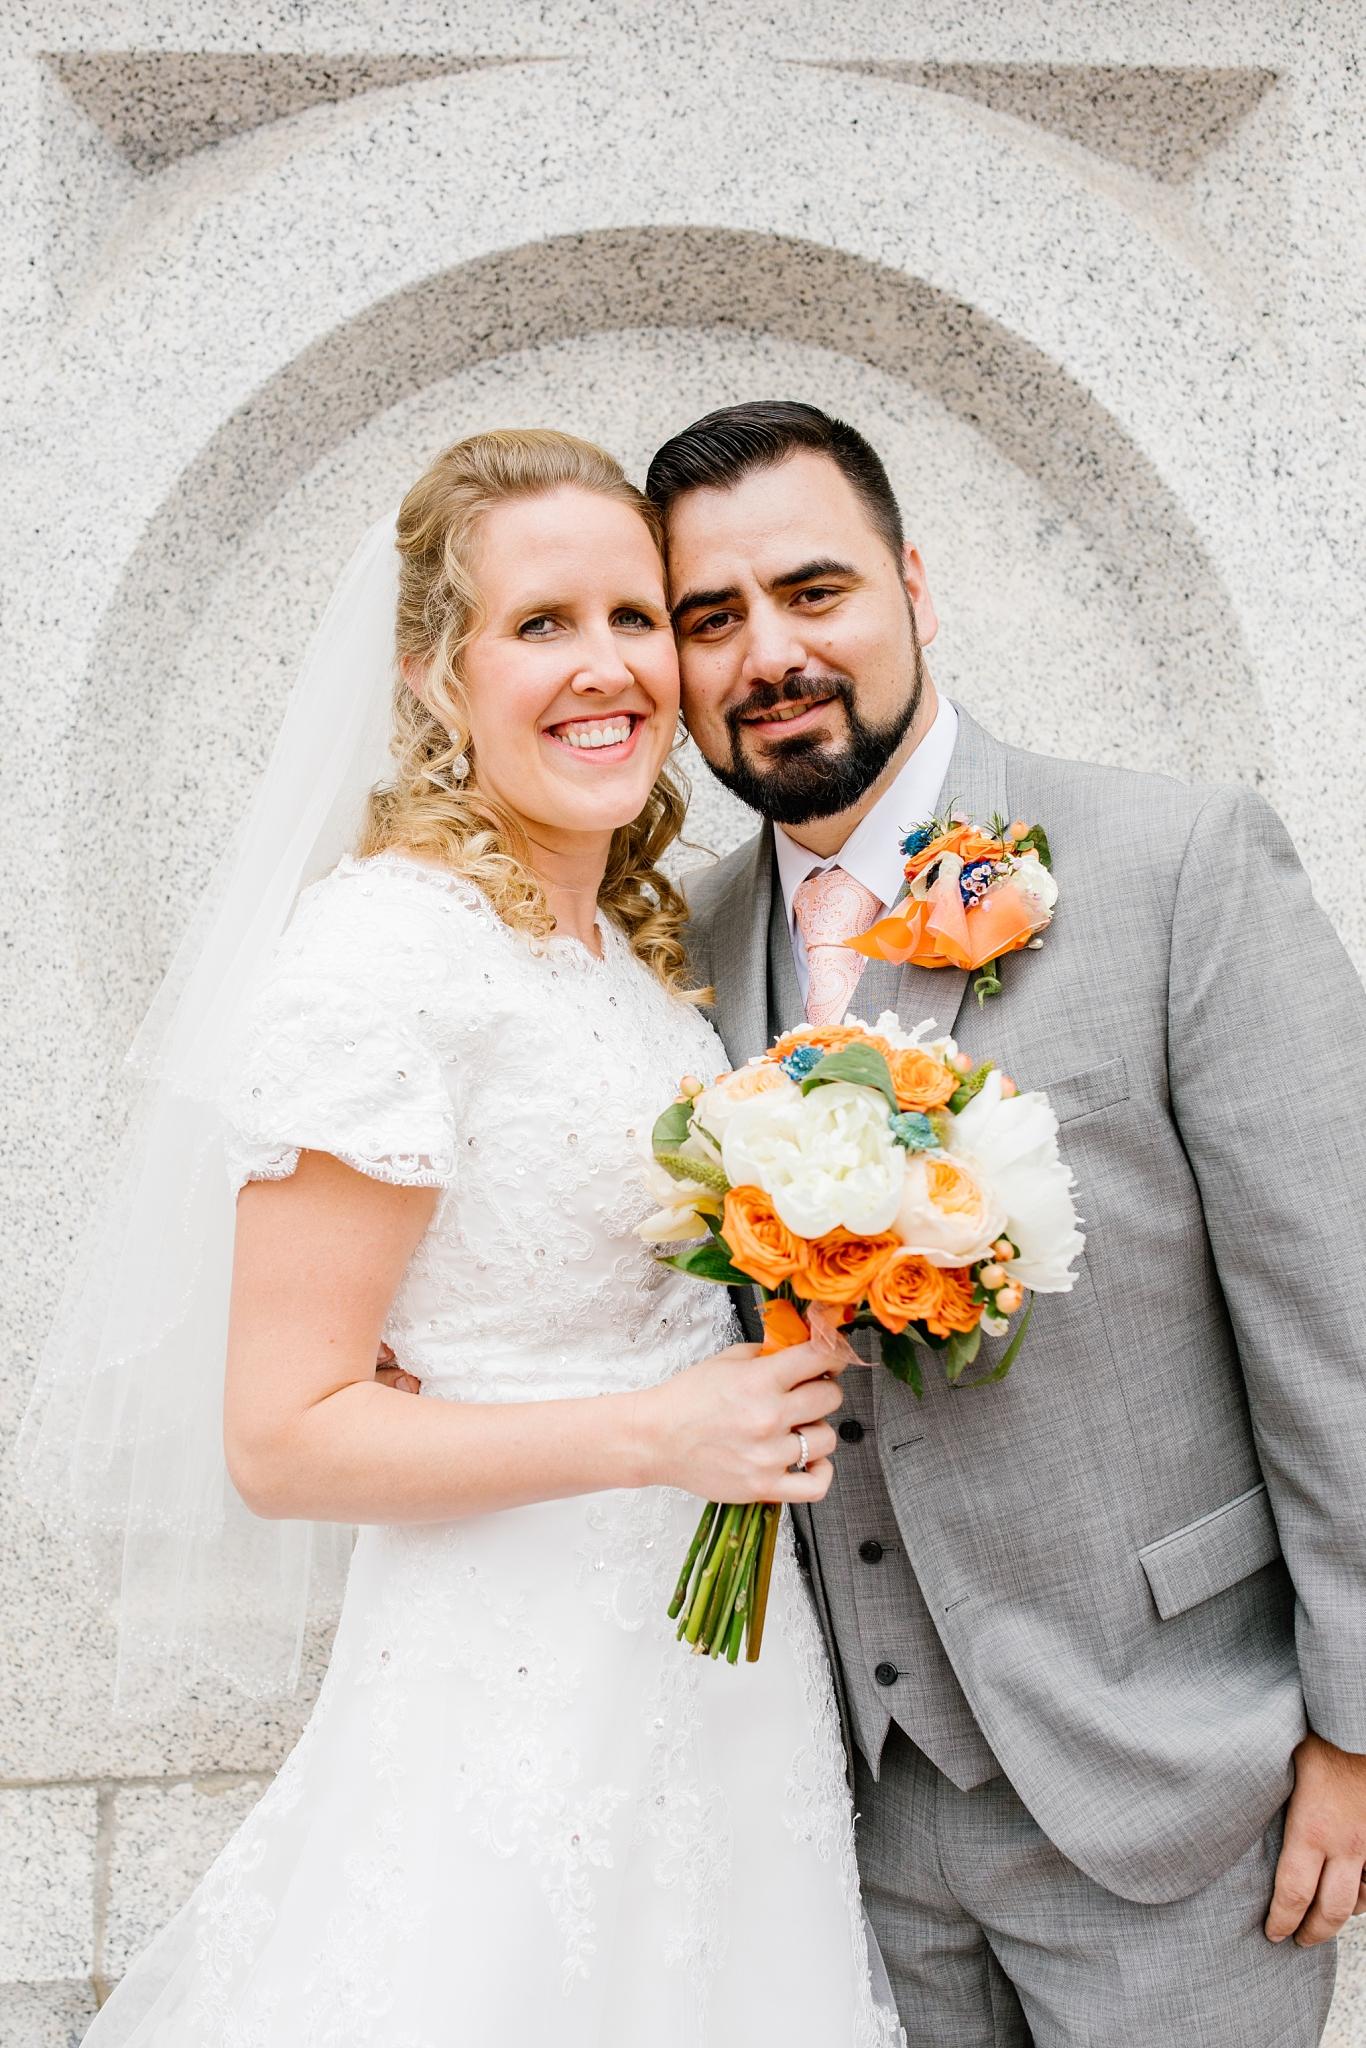 Justin and Melissa-121_Lizzie-B-Imagery-Utah-Wedding-Photographer-Salt-Lake-City-Temple-Photographer-Lion-House-Luncheon-The-Grand-Ballroom-Bountiful.jpg